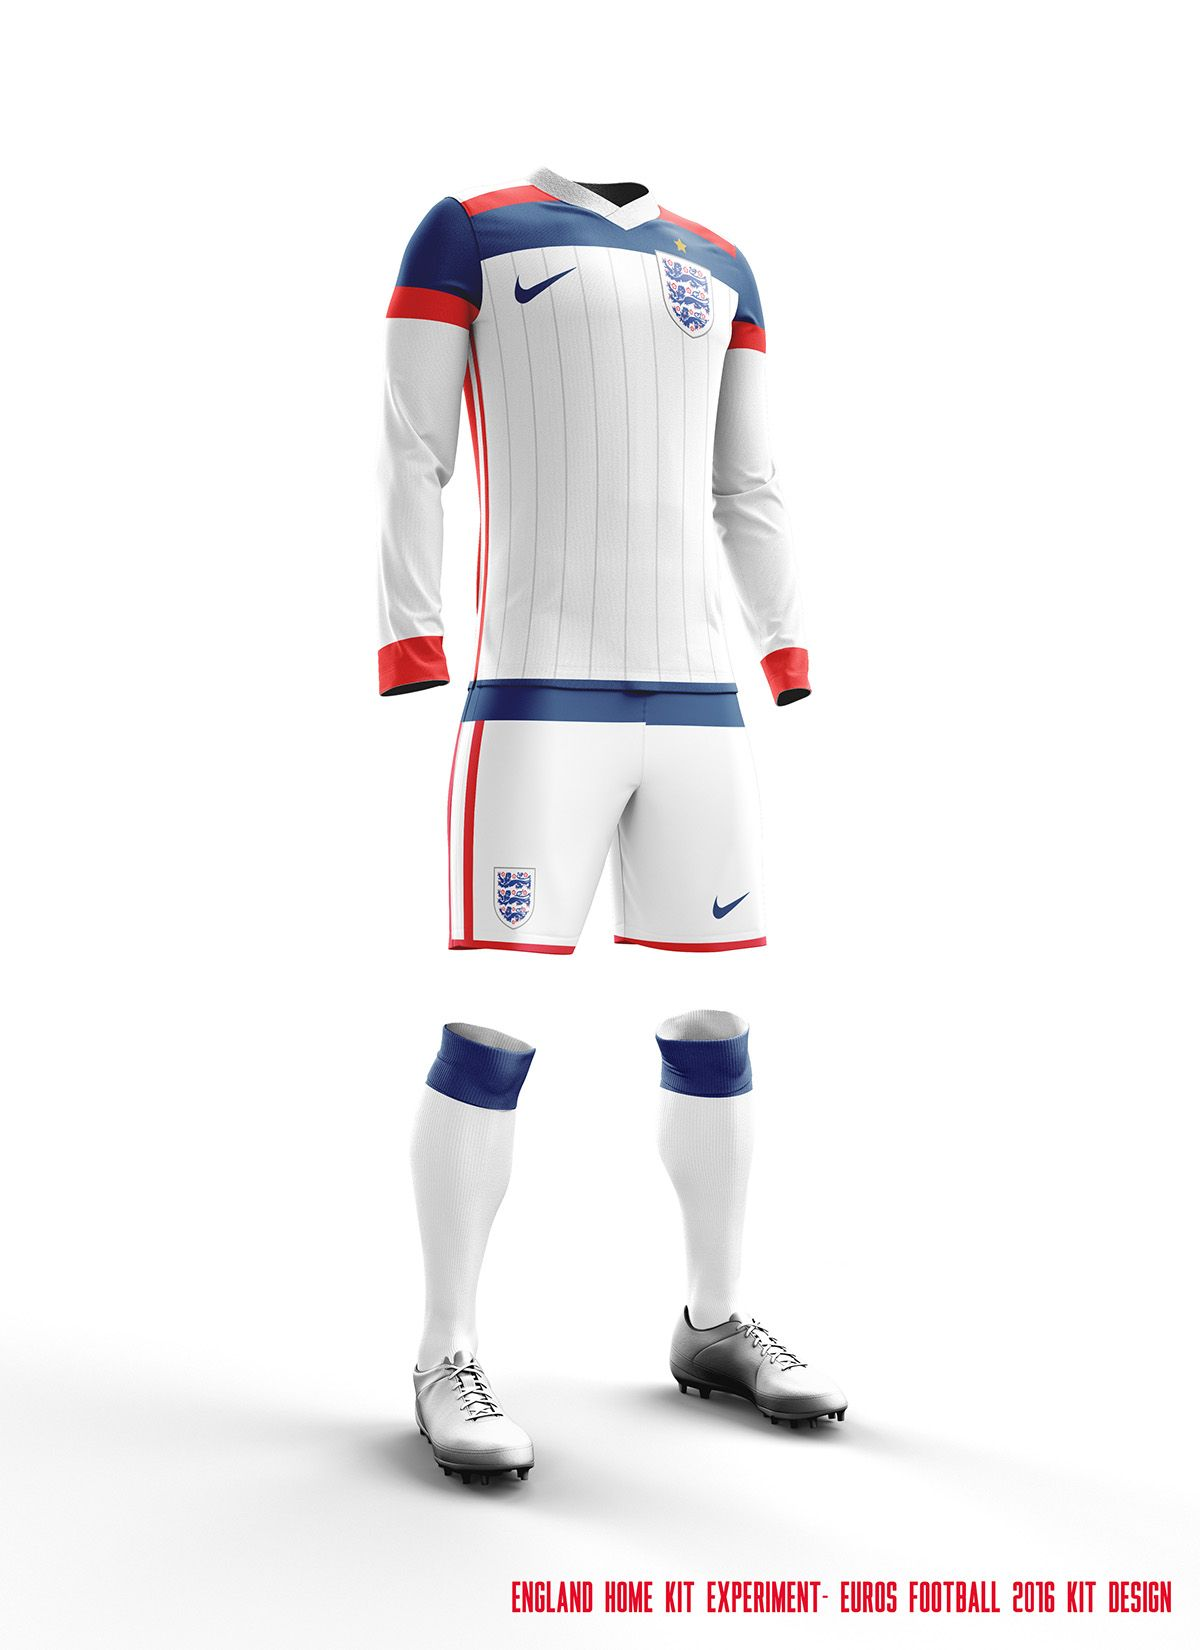 Football Kit Designs on Behance. Football Kit Designs on Behance Inglaterra  Futbol cf71581c9d465